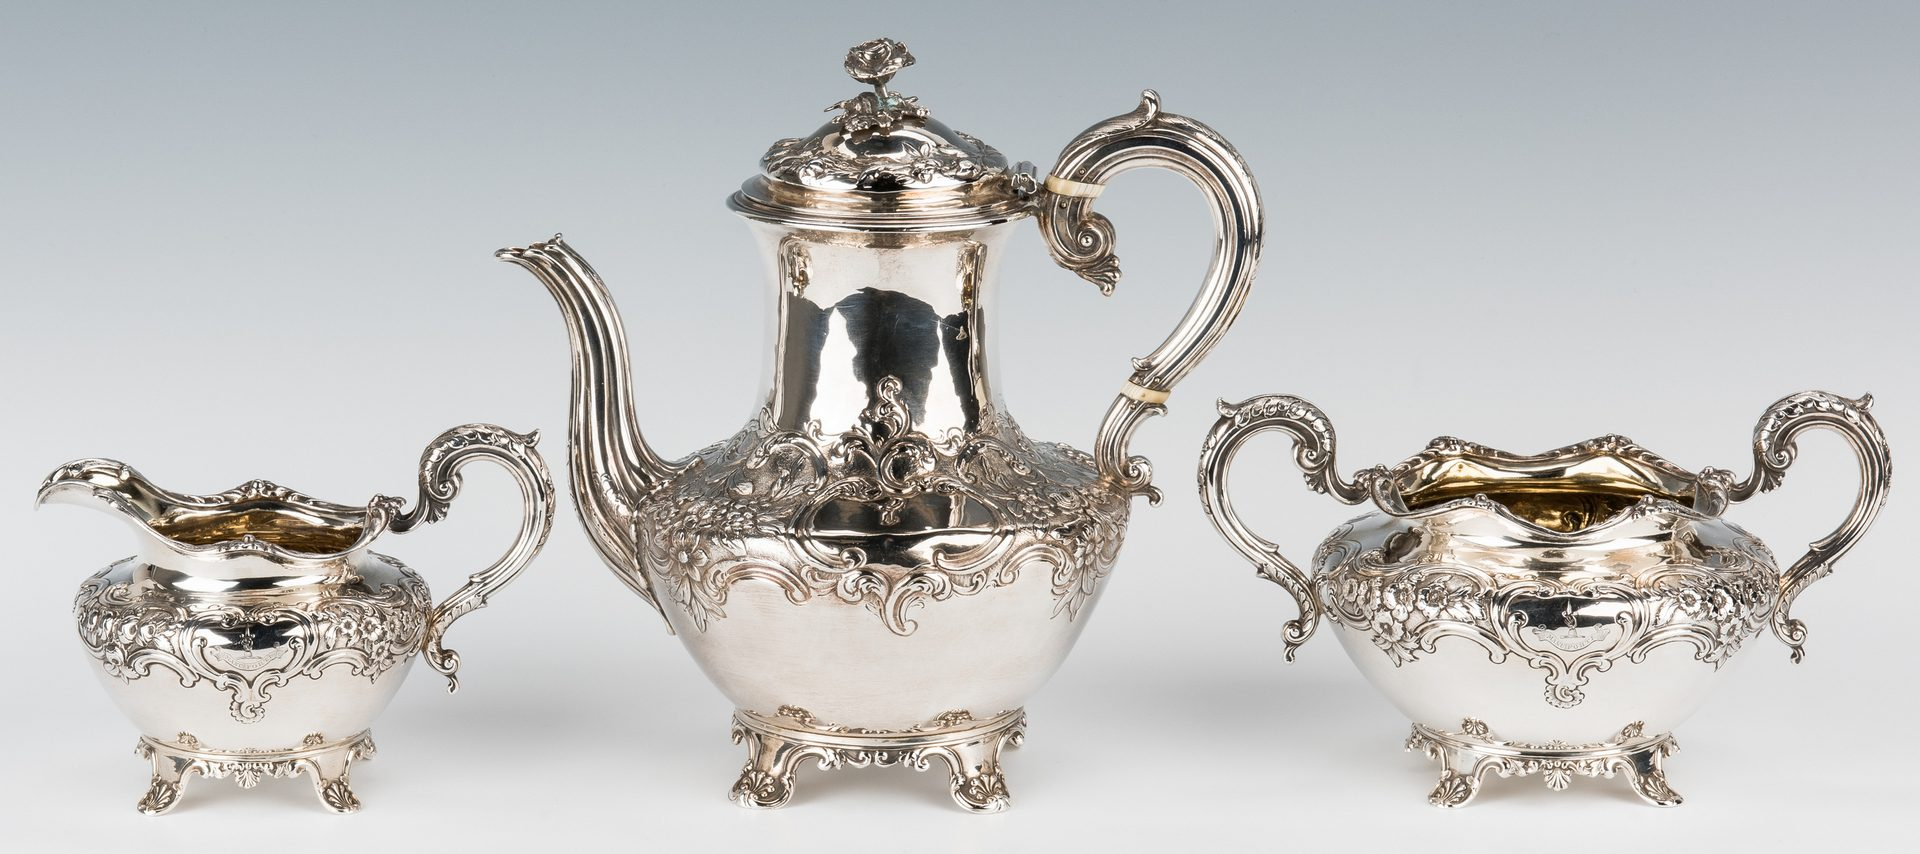 Lot 61: William IV Silver Tea Set, Barnard, 3 pcs